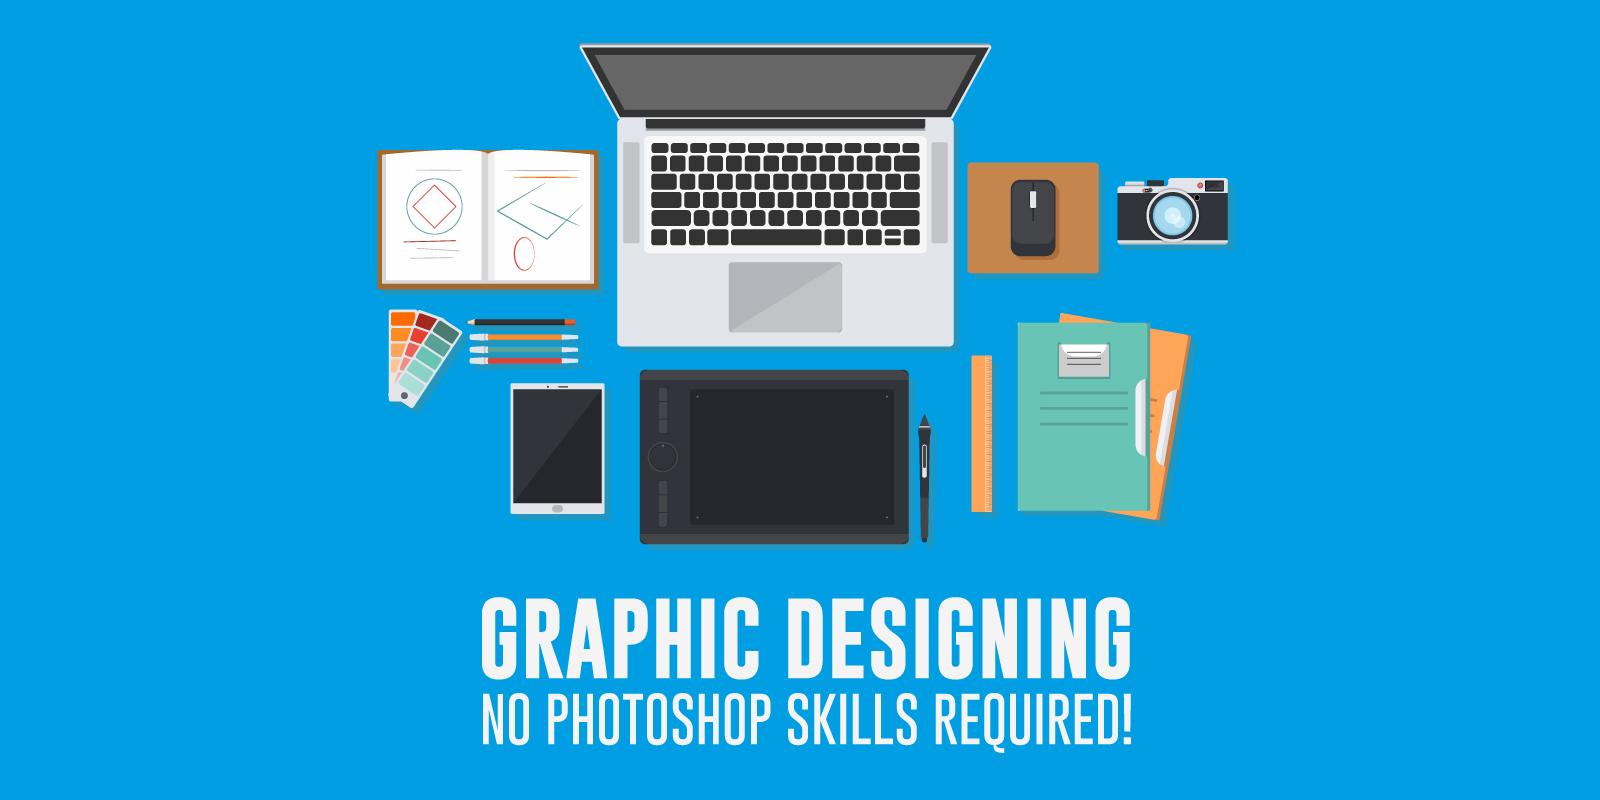 Graphic Designing – No Photoshop skills required!